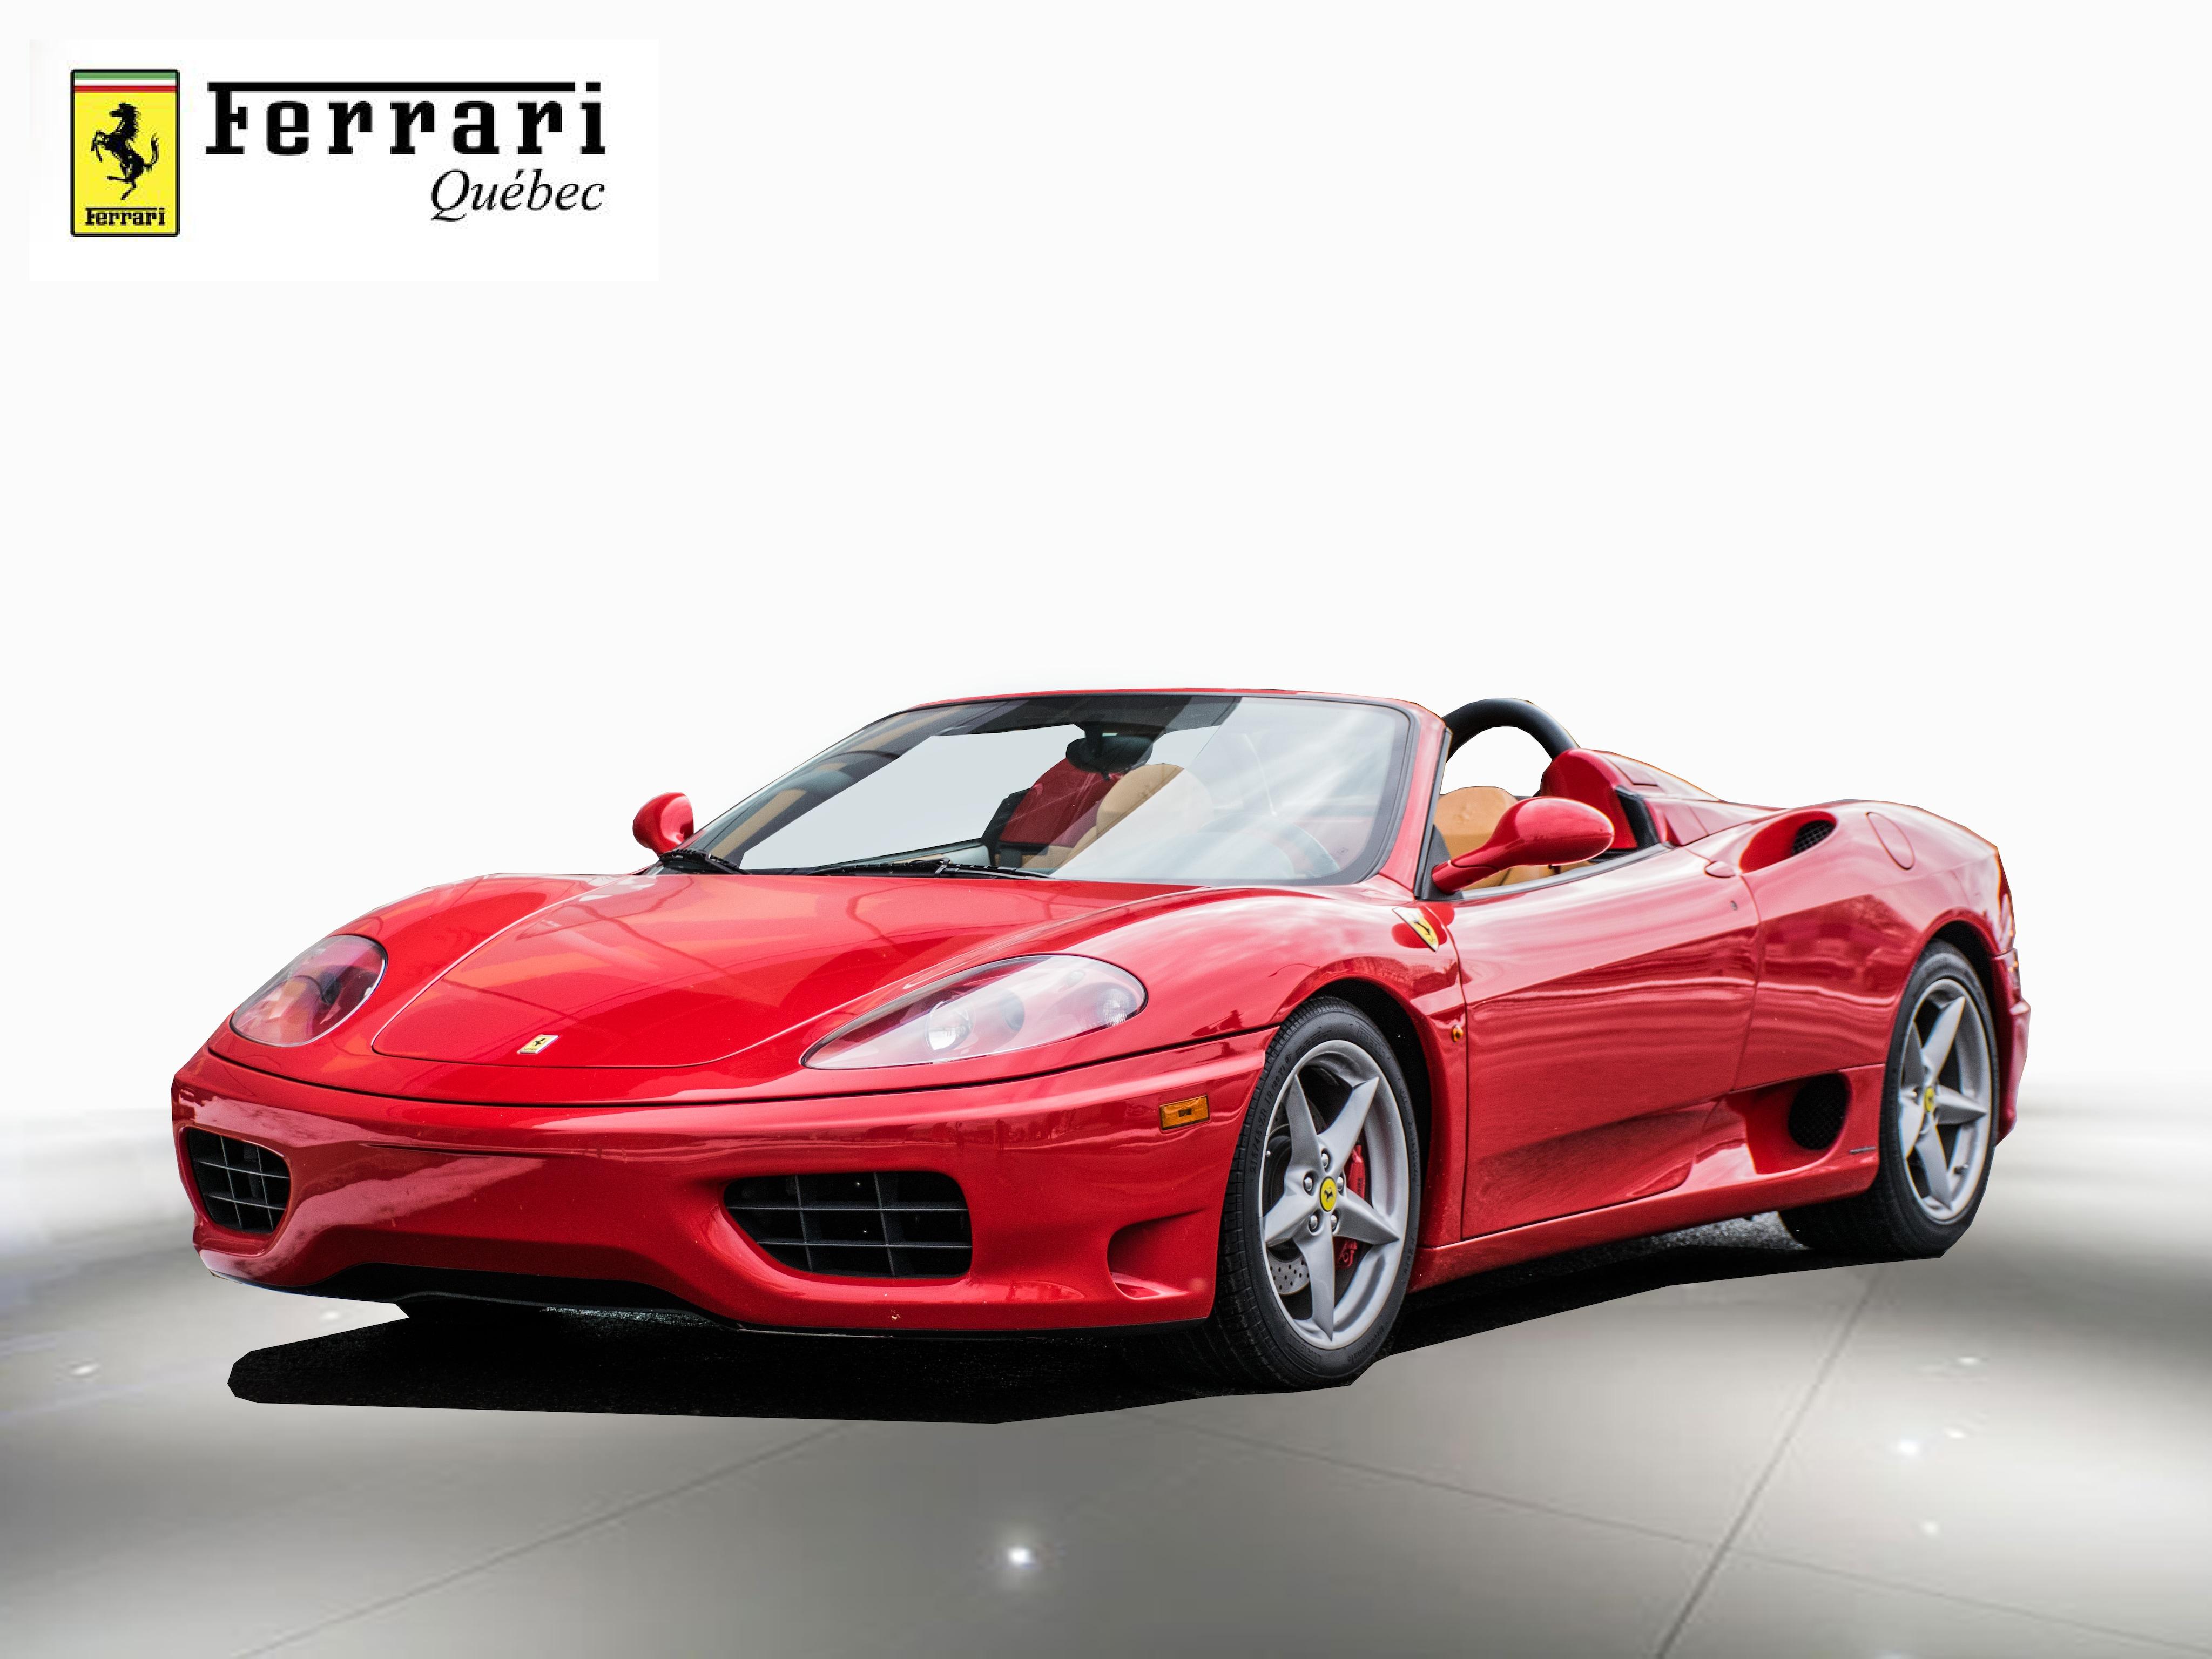 2001 Ferrari 360 Spider F1 Convertible